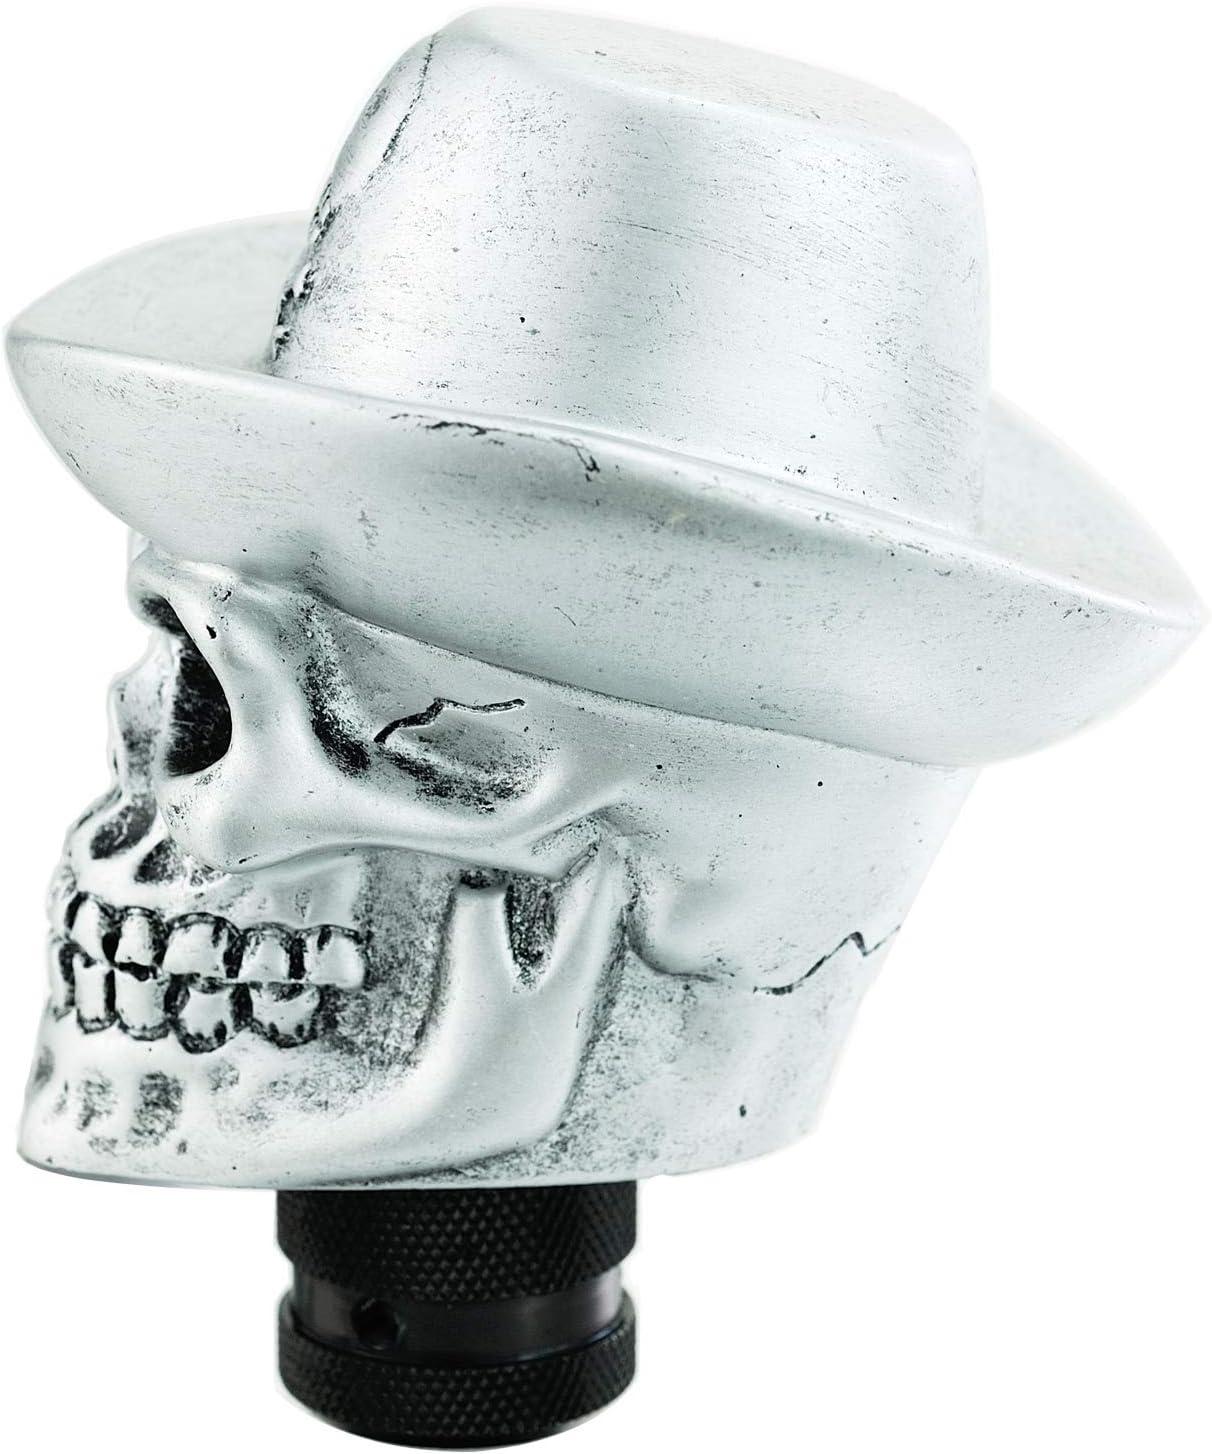 Blue Hat Lunsom Skull Gear Knob Hat Car Transmission Shifter Stick Handle Head Fit Universal Automatic Manual Vehicle